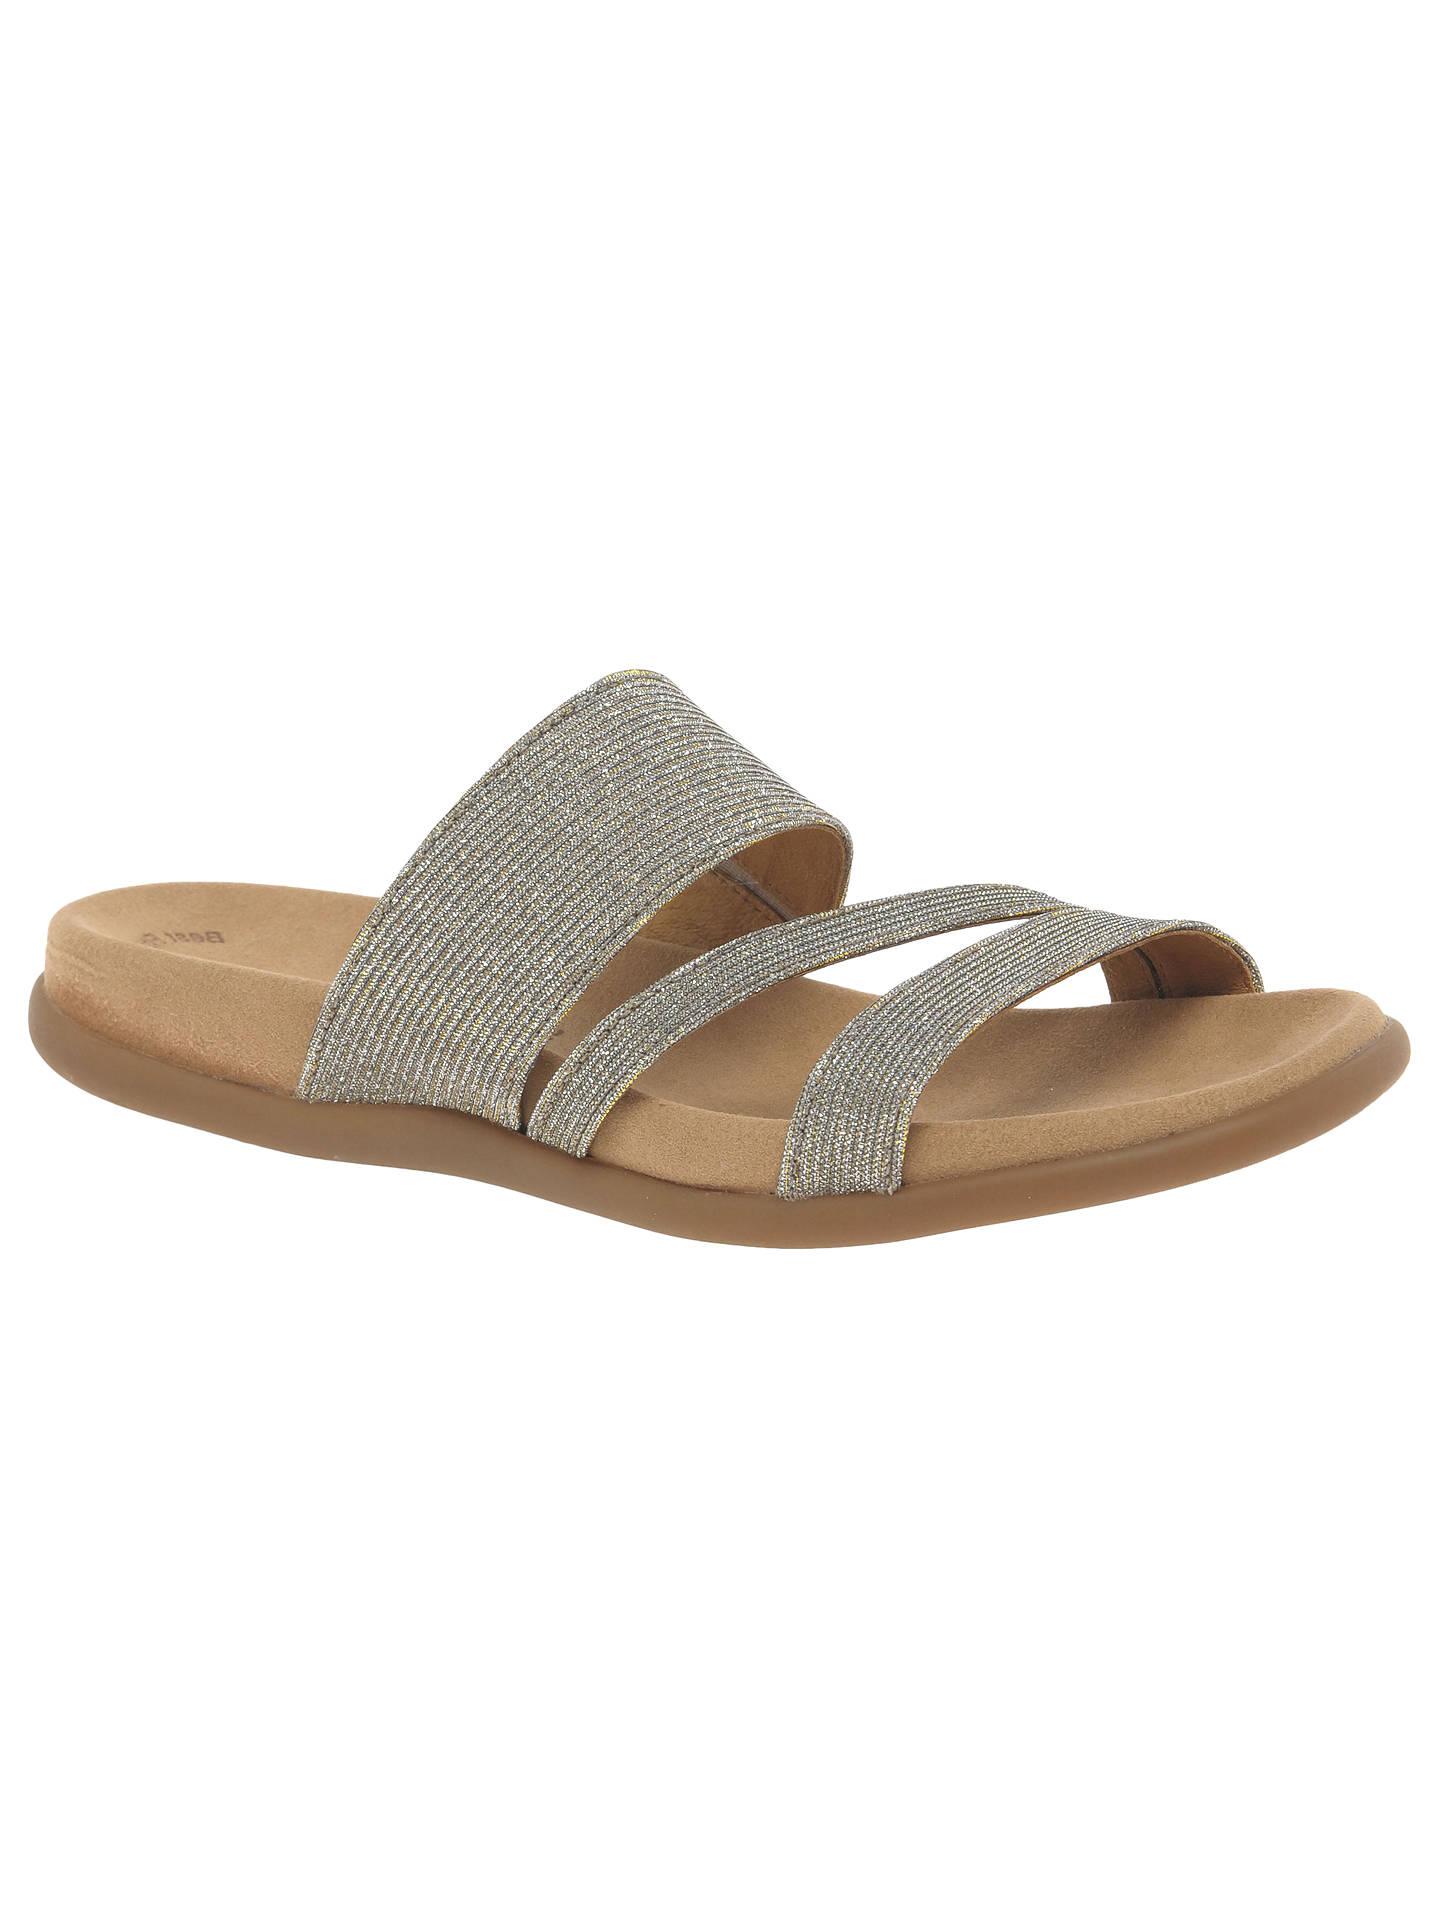 ddedbaf54044 Buy Gabor Tomcat 2 Slip On Sandals